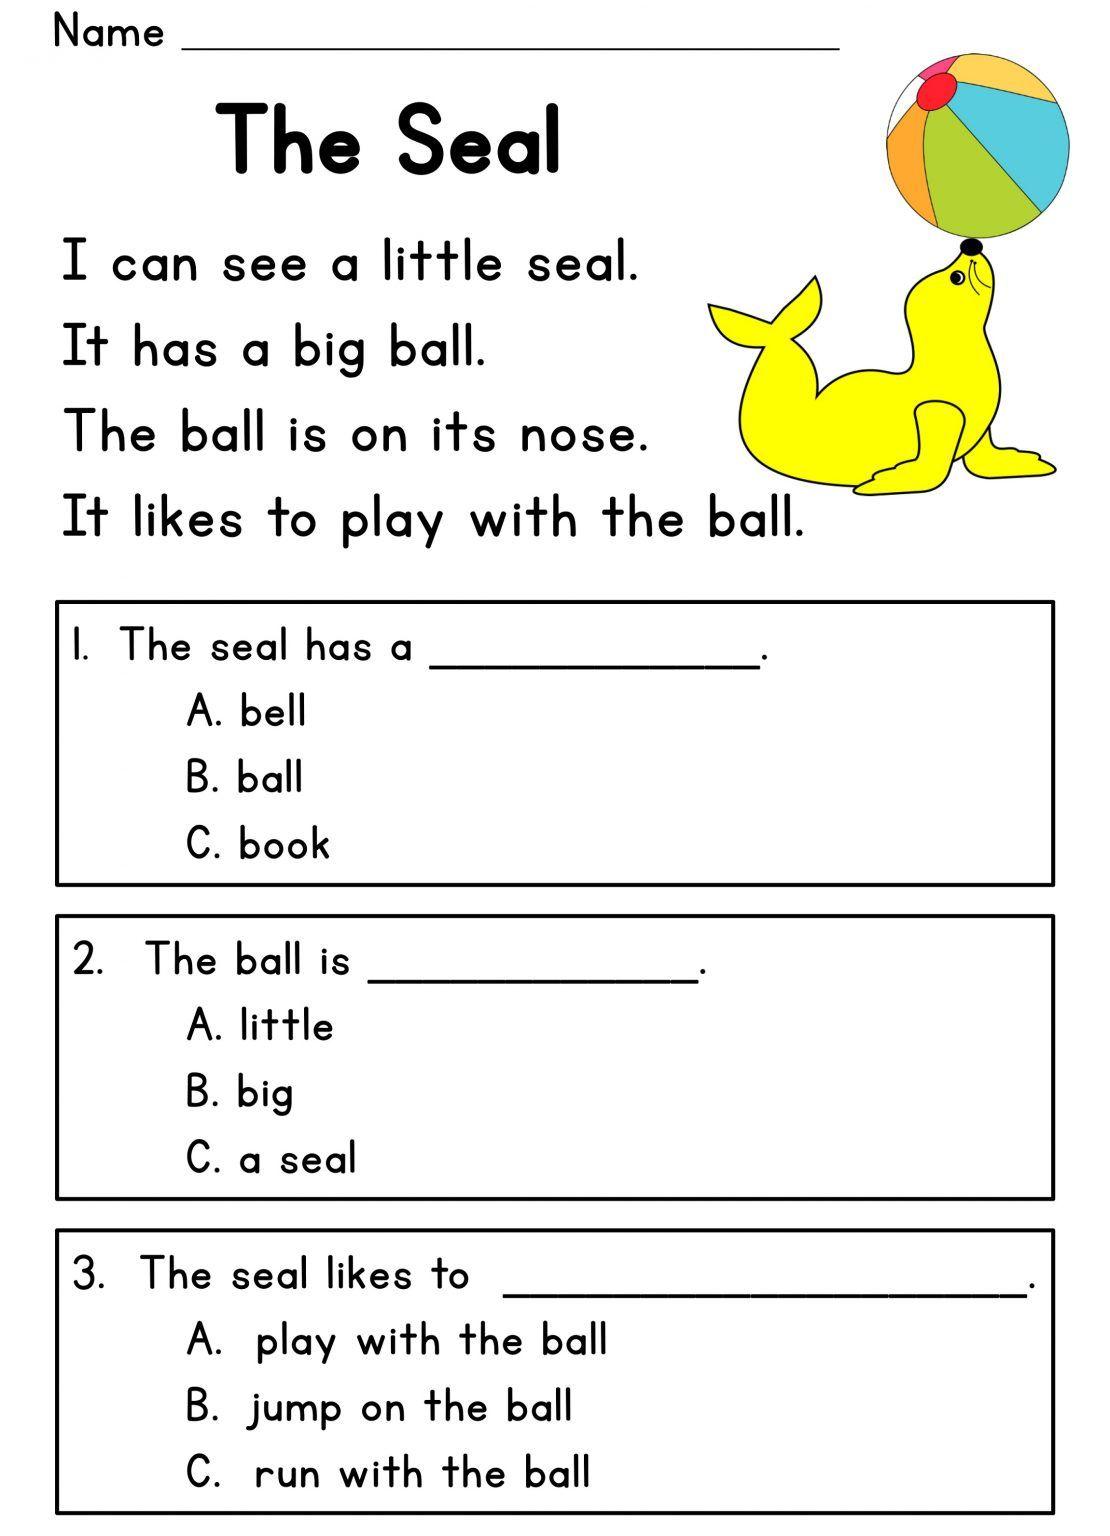 Free Printable Worksheets For 5 Year Olds Educative Printable Reading Comprehension Kindergarten Reading Comprehension Passages Kindergarten Reading [ 1536 x 1110 Pixel ]